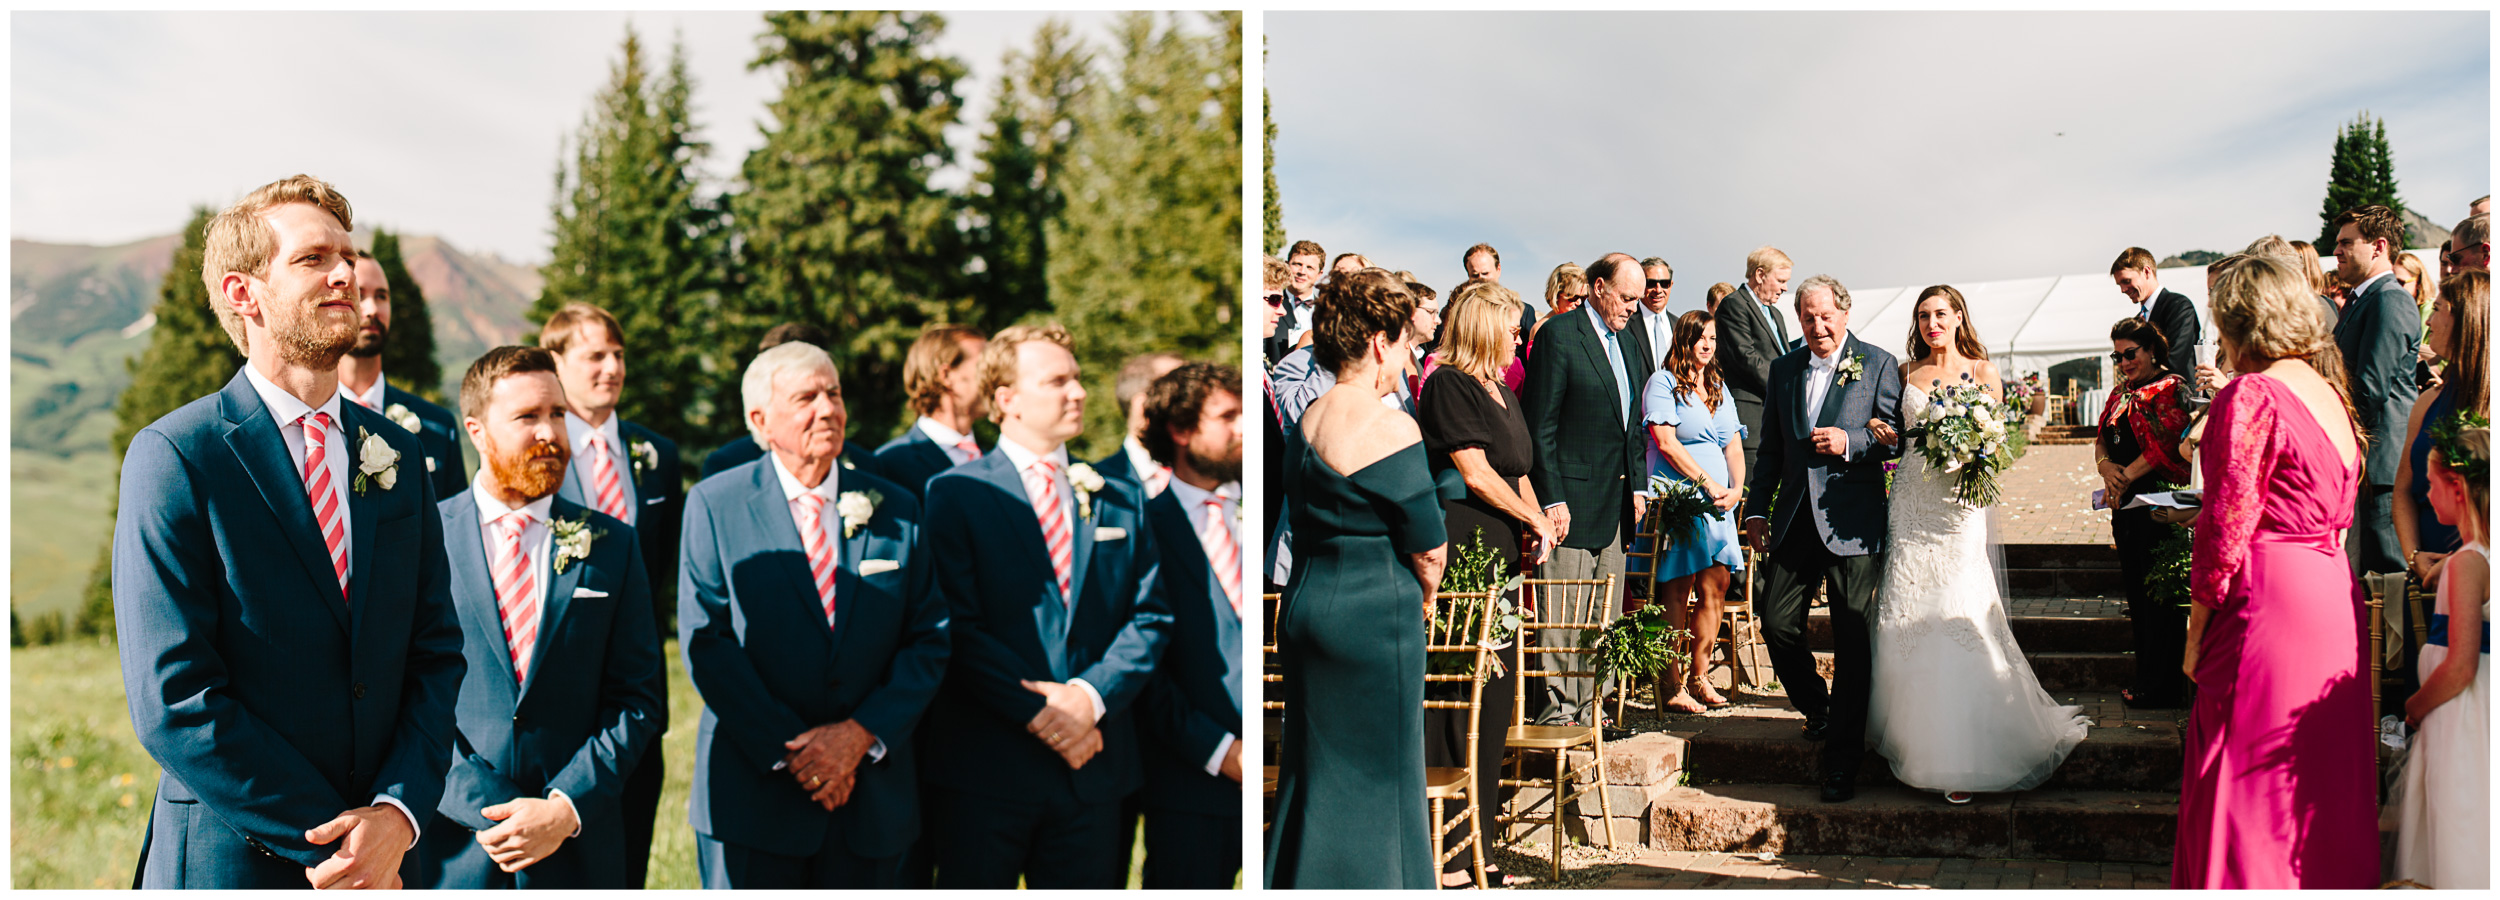 crested_butte_wedding_84.jpg